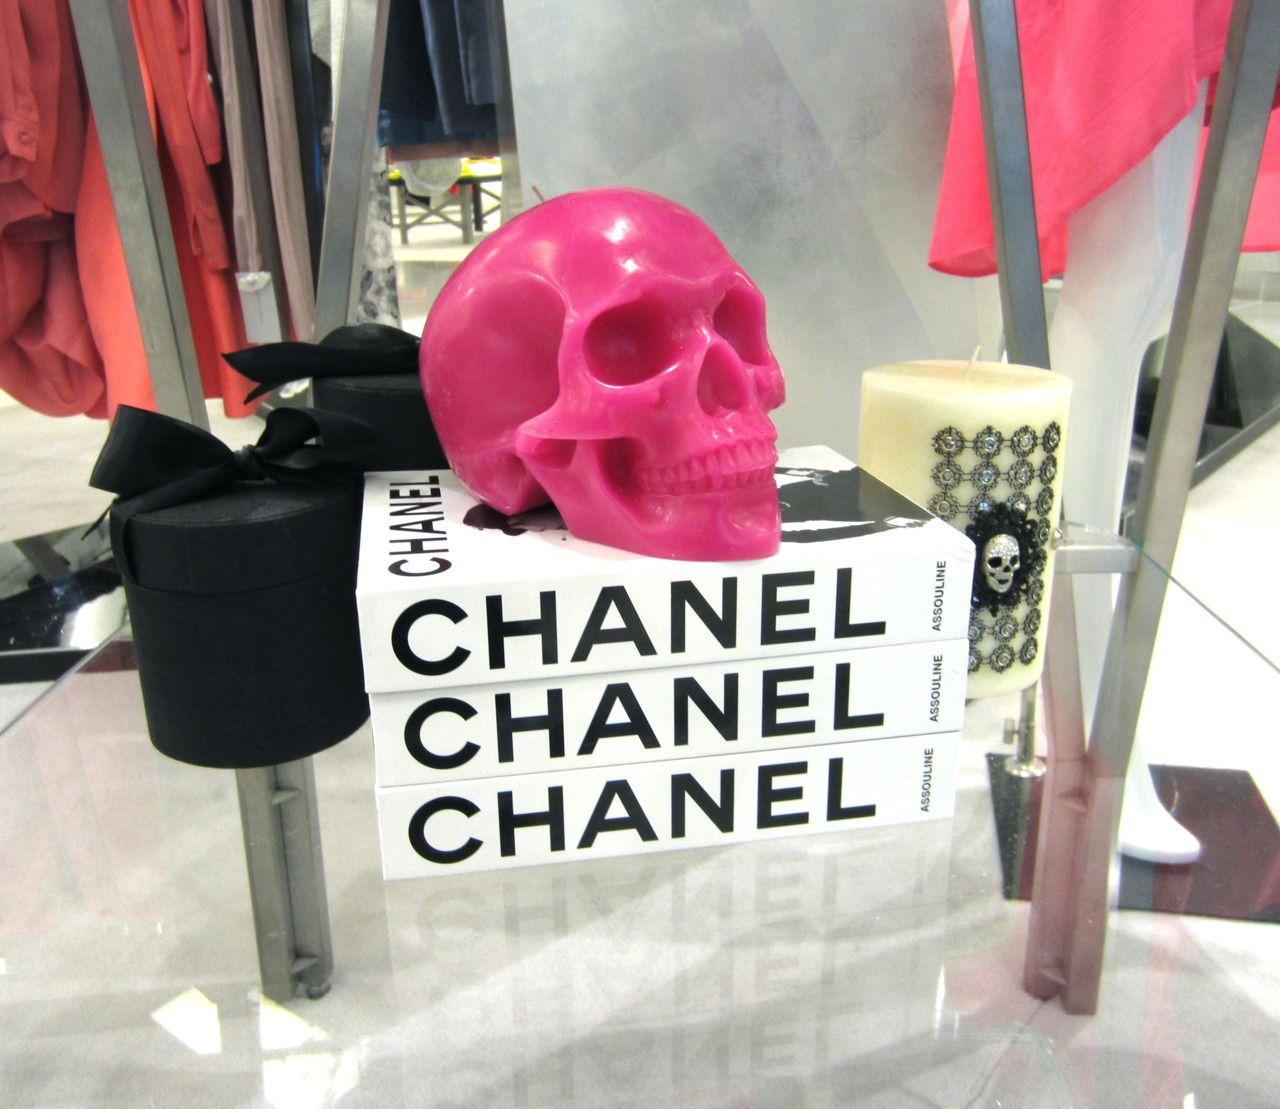 Chanel Makeup room